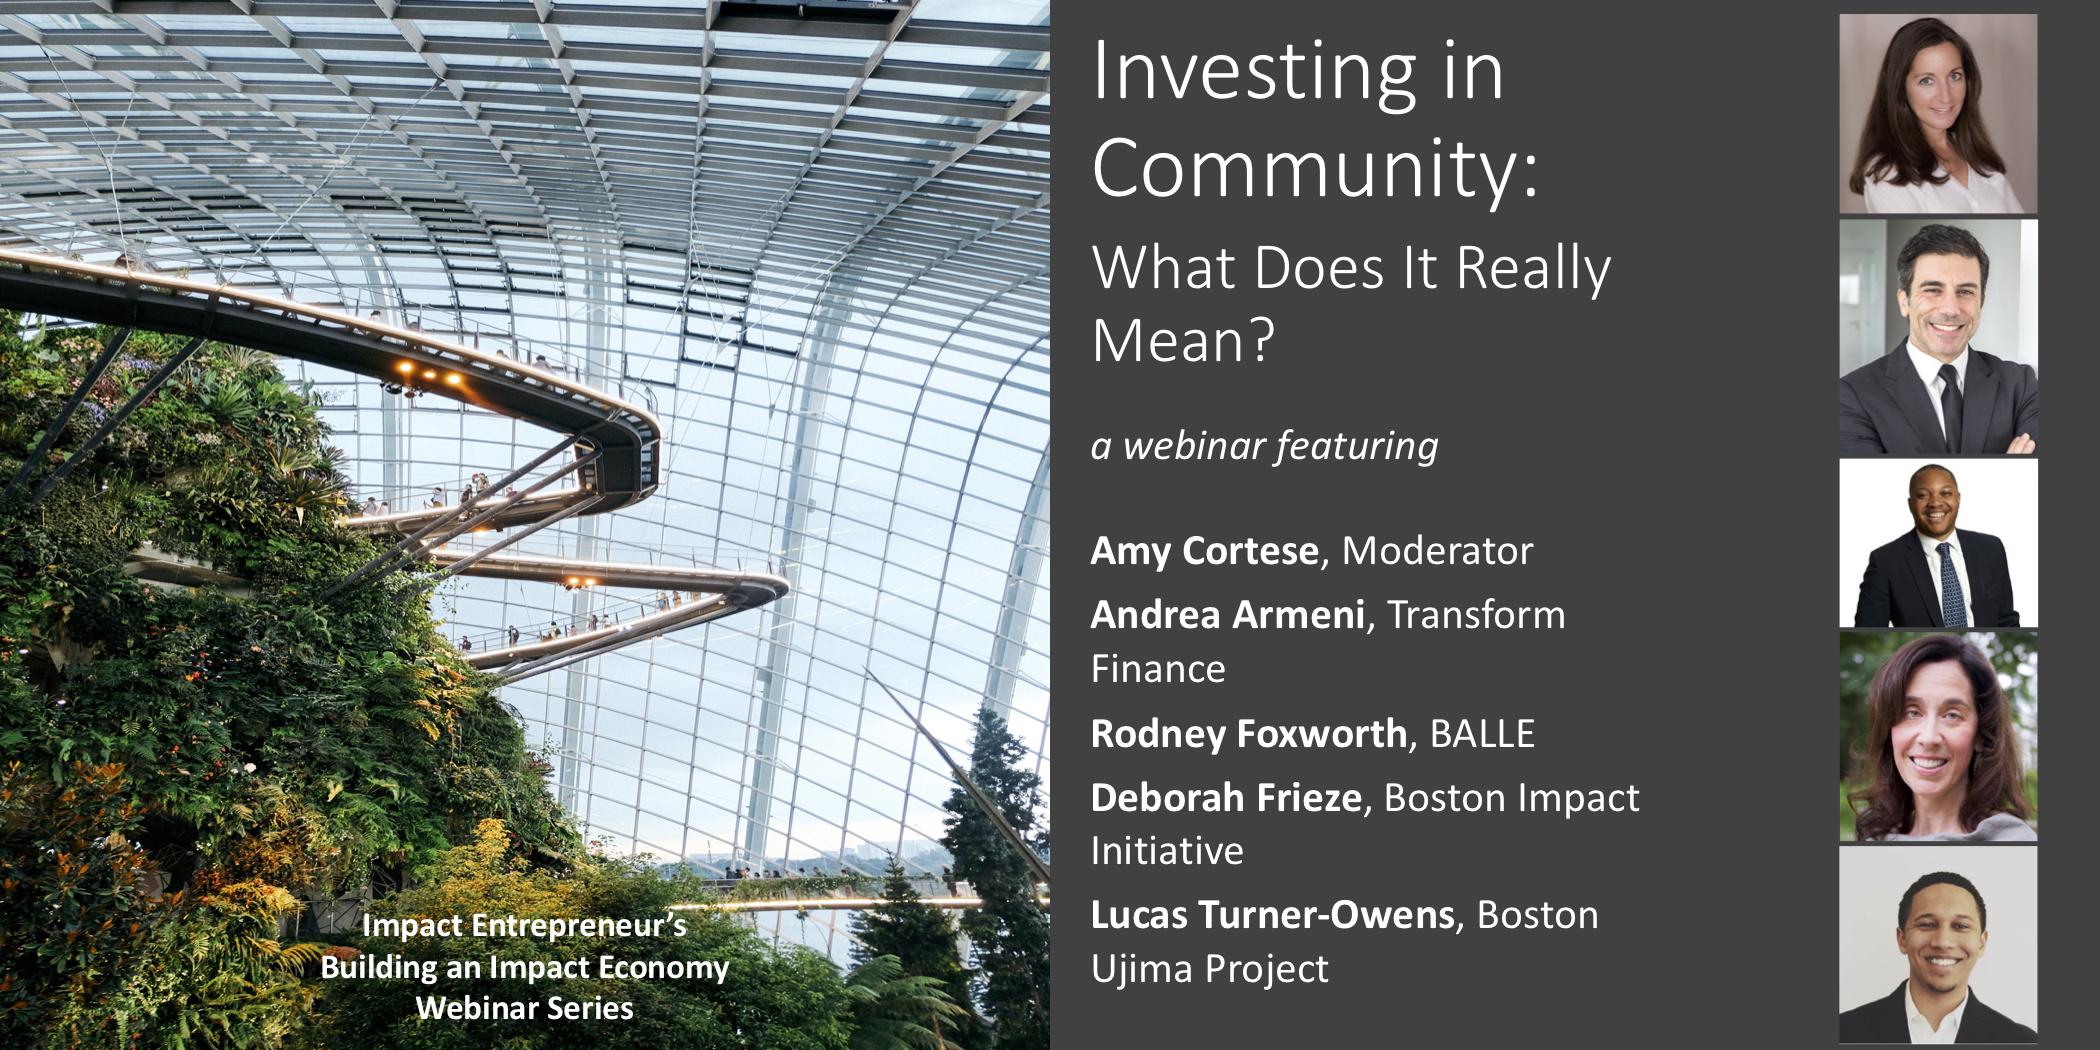 Investing in Community Lead Image.jpg